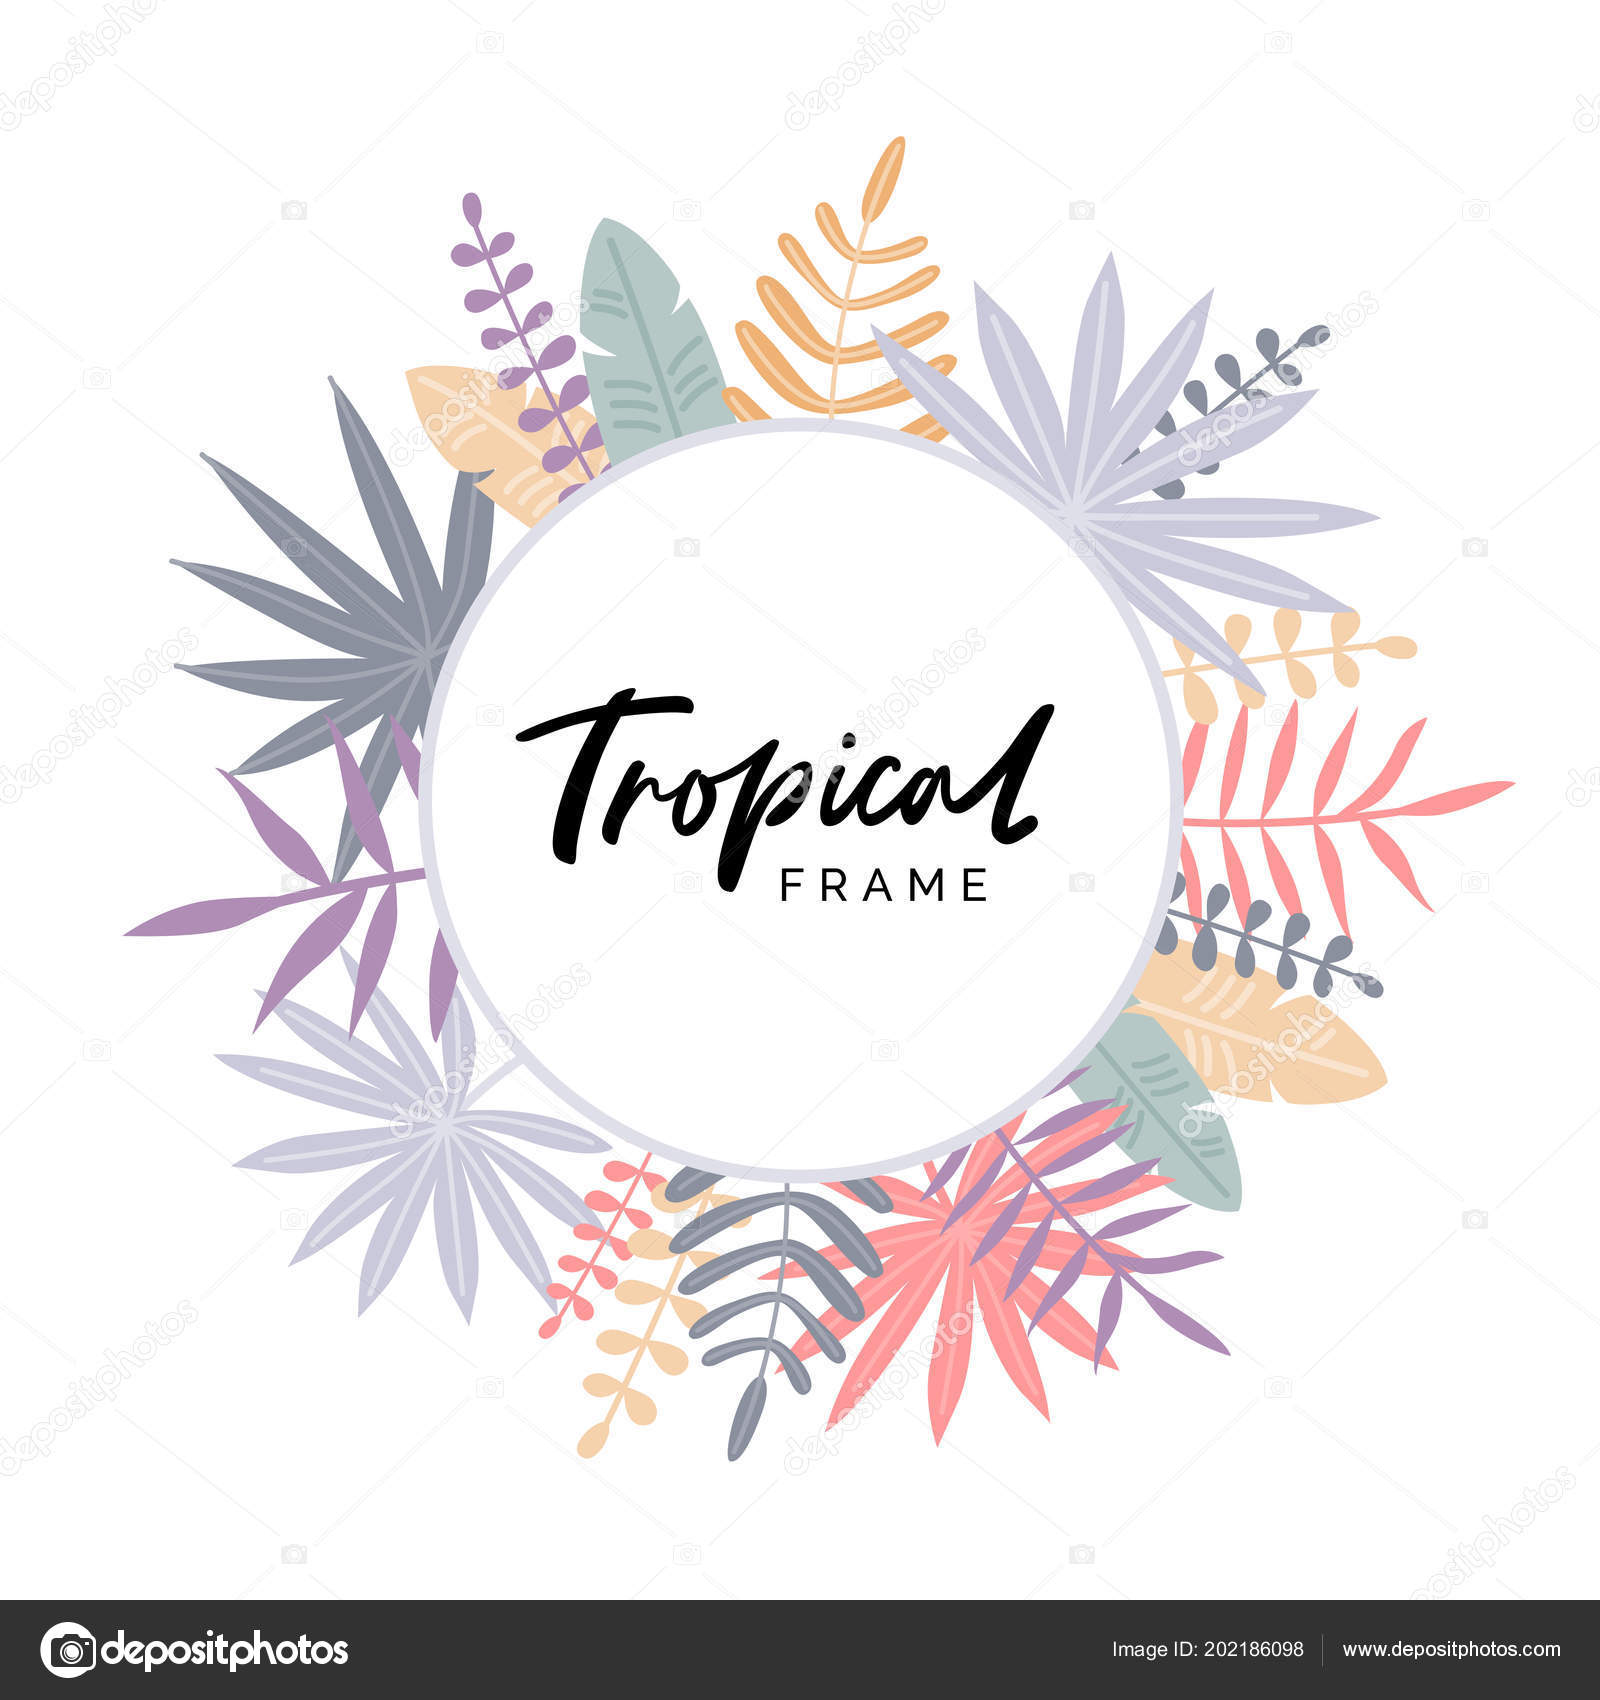 Tarjeta Felicitación Con Marco Tropical Ilustración